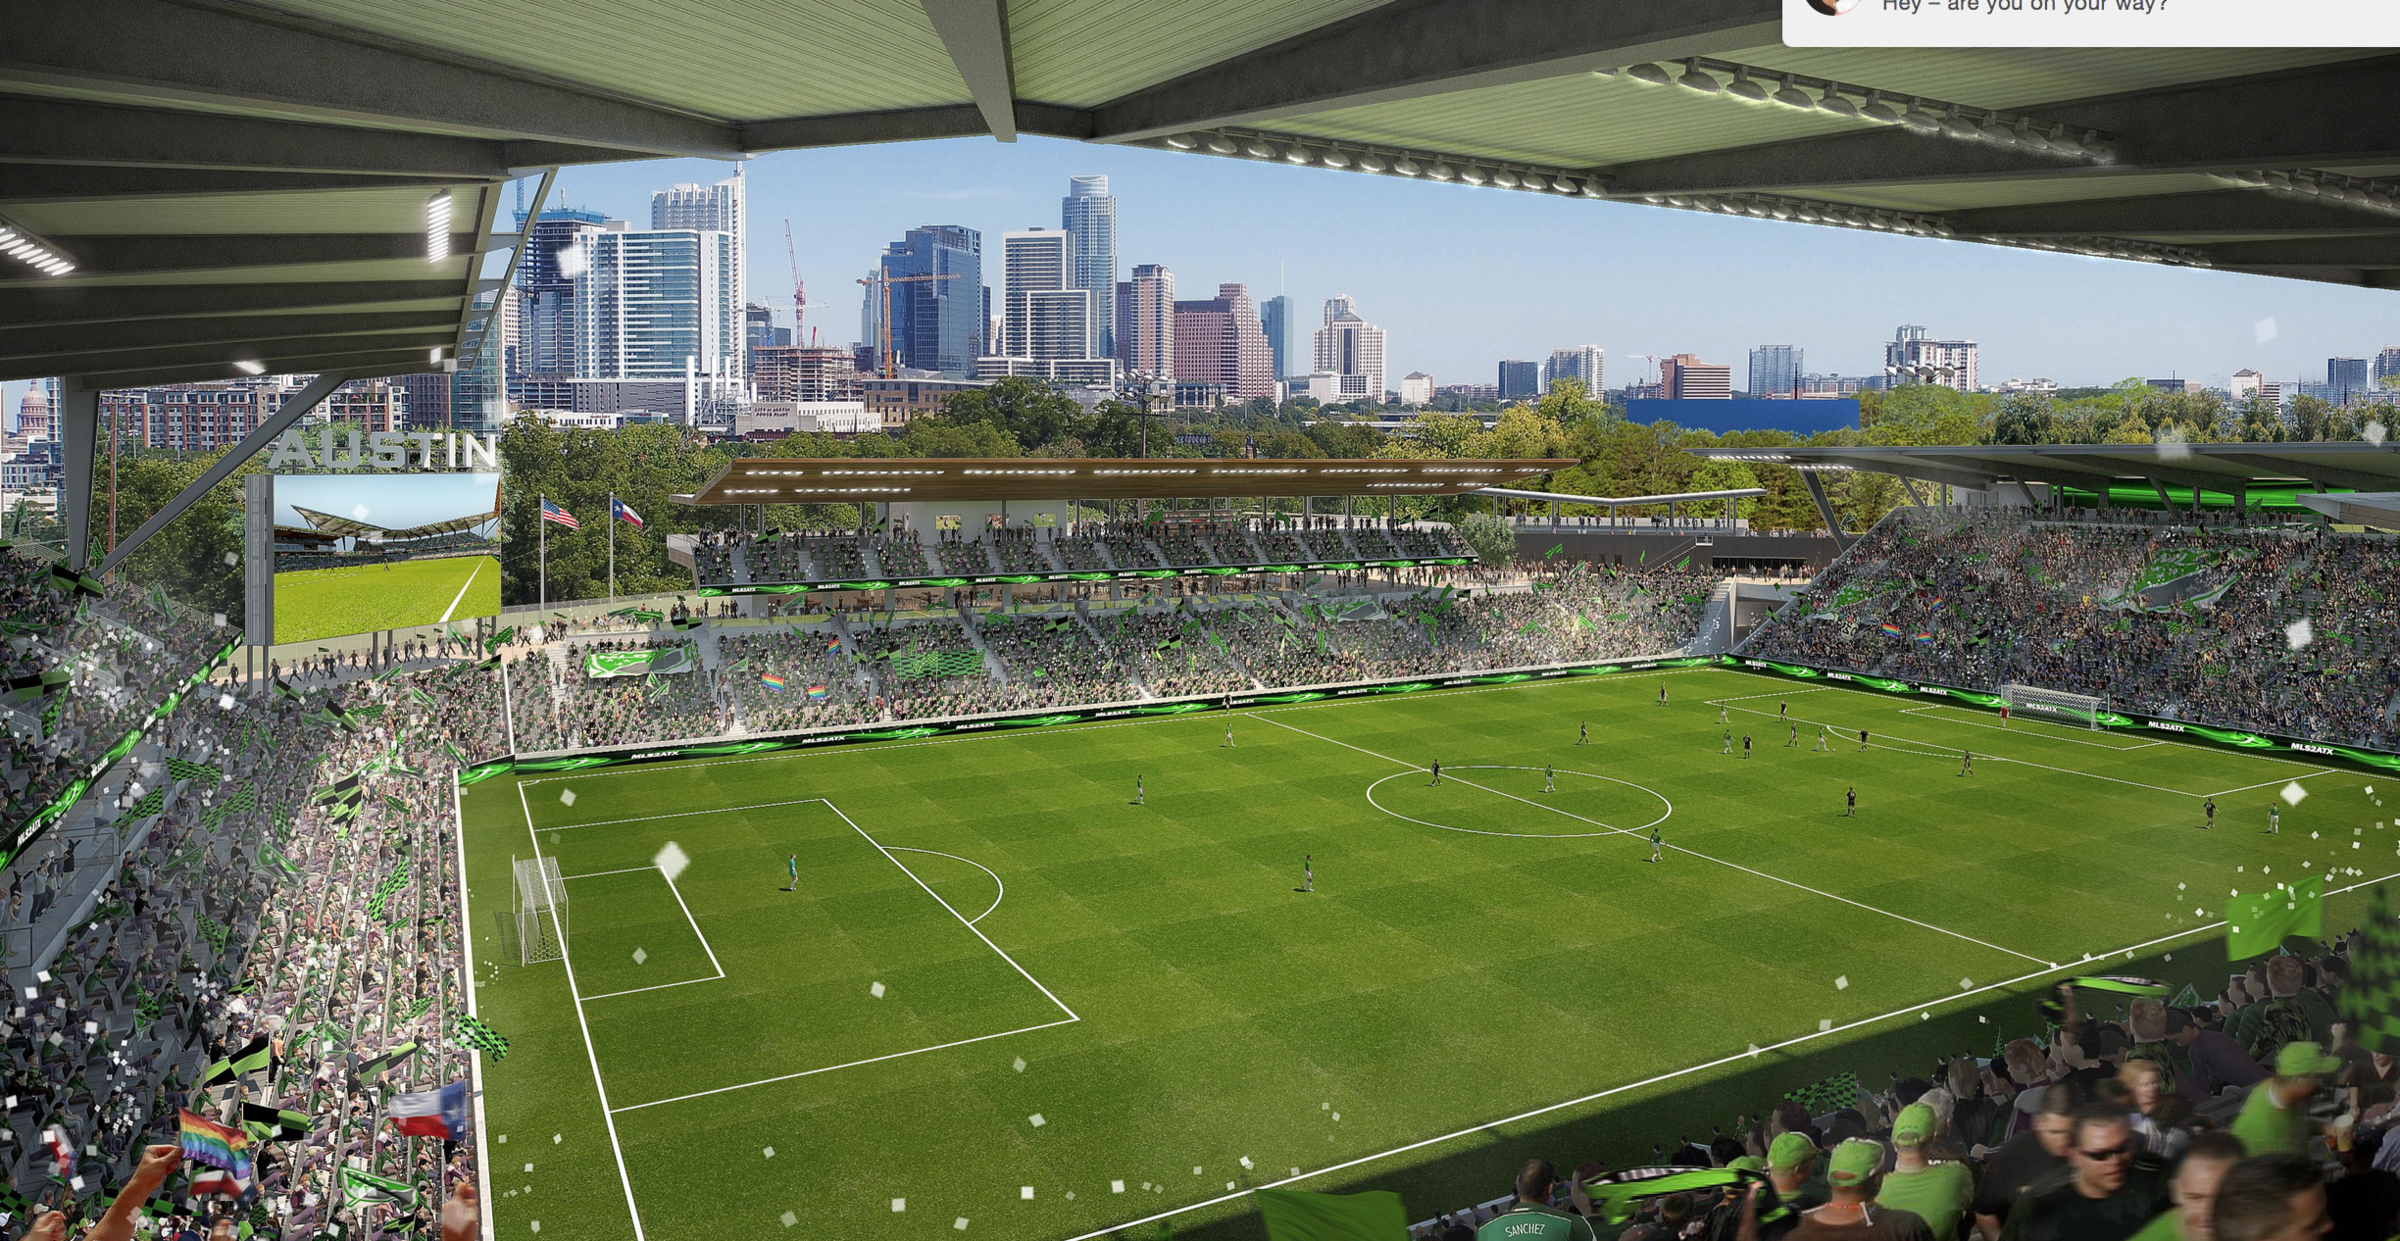 Columbus Crew Releases Images Of Potential Soccer Stadium